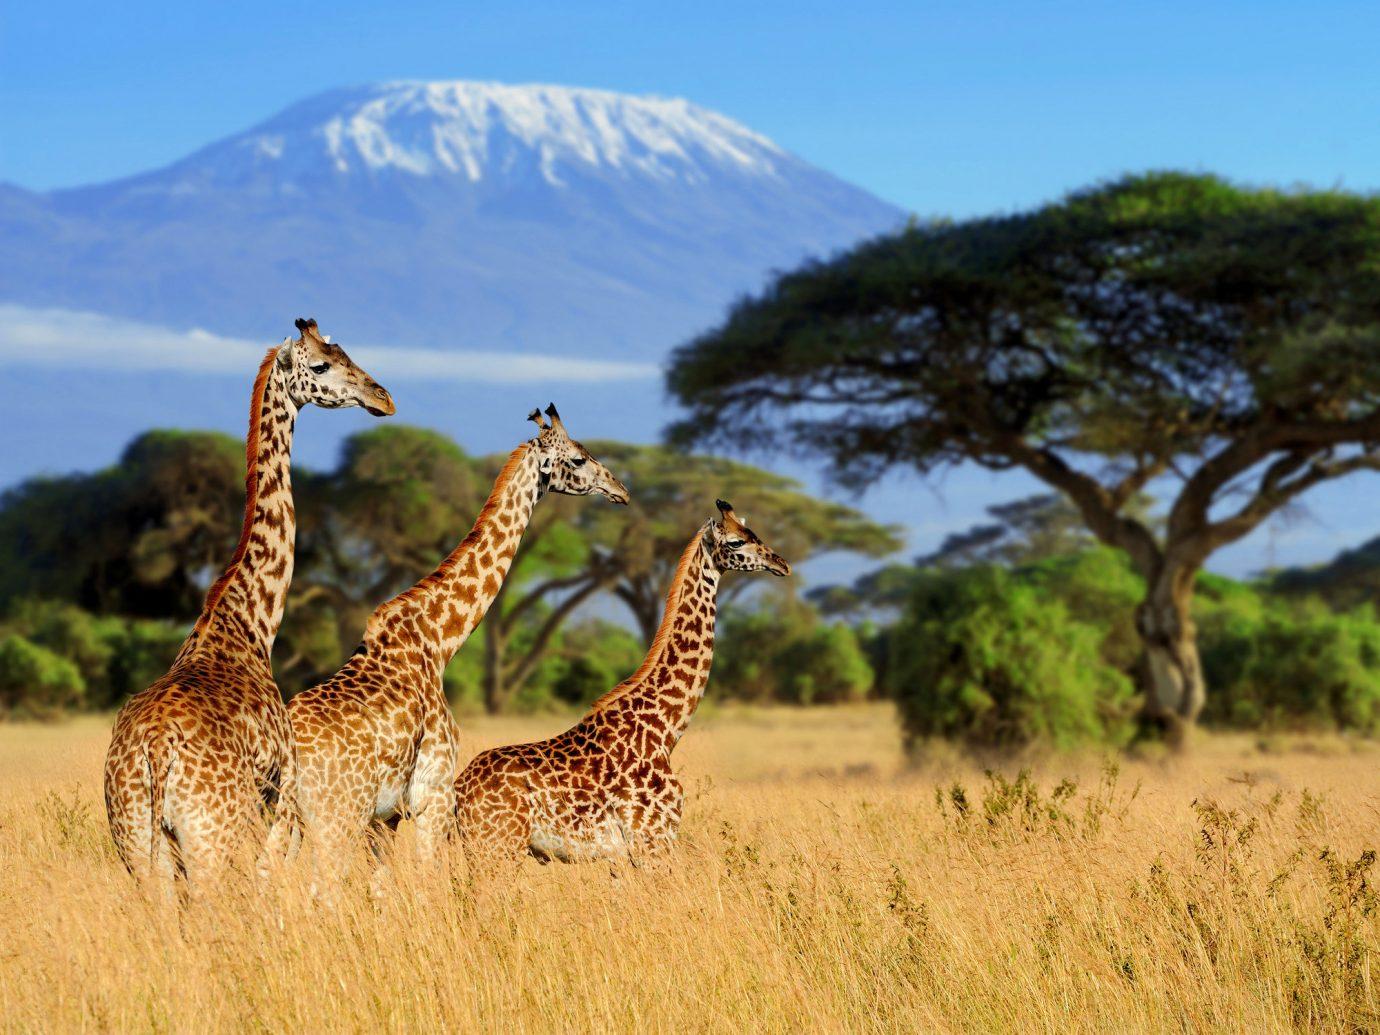 Trip Ideas outdoor grass sky animal field giraffe savanna mammal Wildlife fauna ecosystem natural environment mountain giraffidae grassland Safari grassy Adventure tall plain prairie